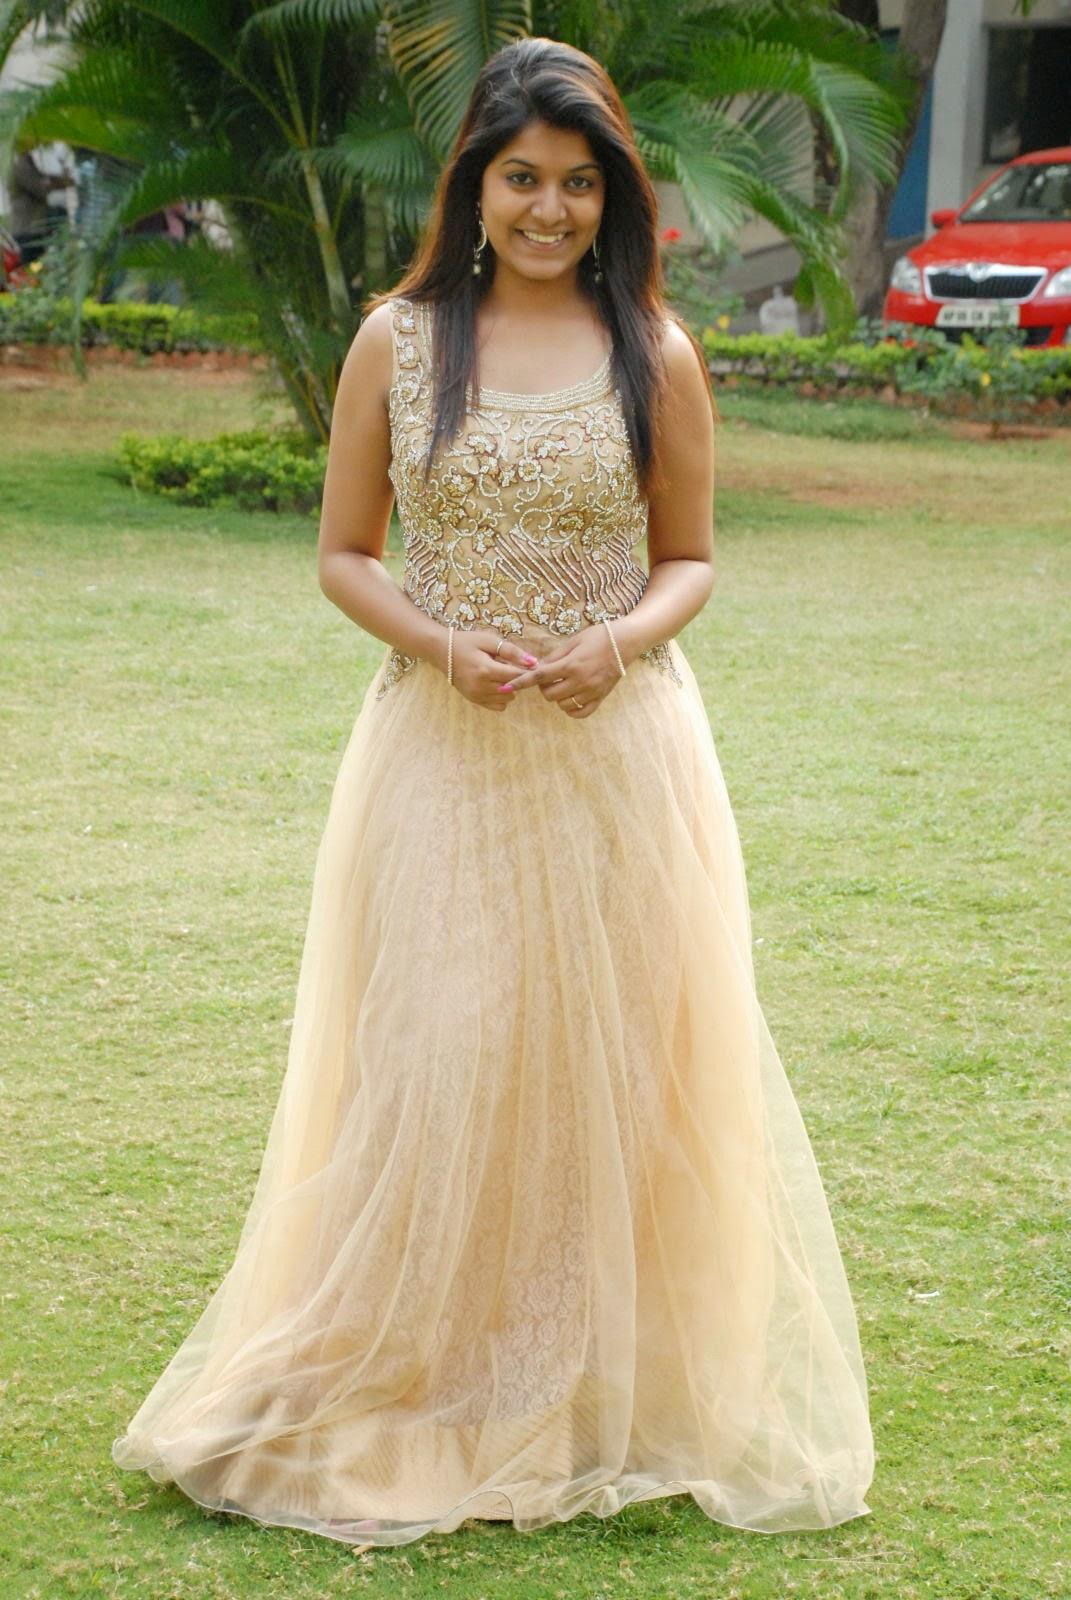 Kavya Kumar Latest Pics in Gown-HQ-Photo-17